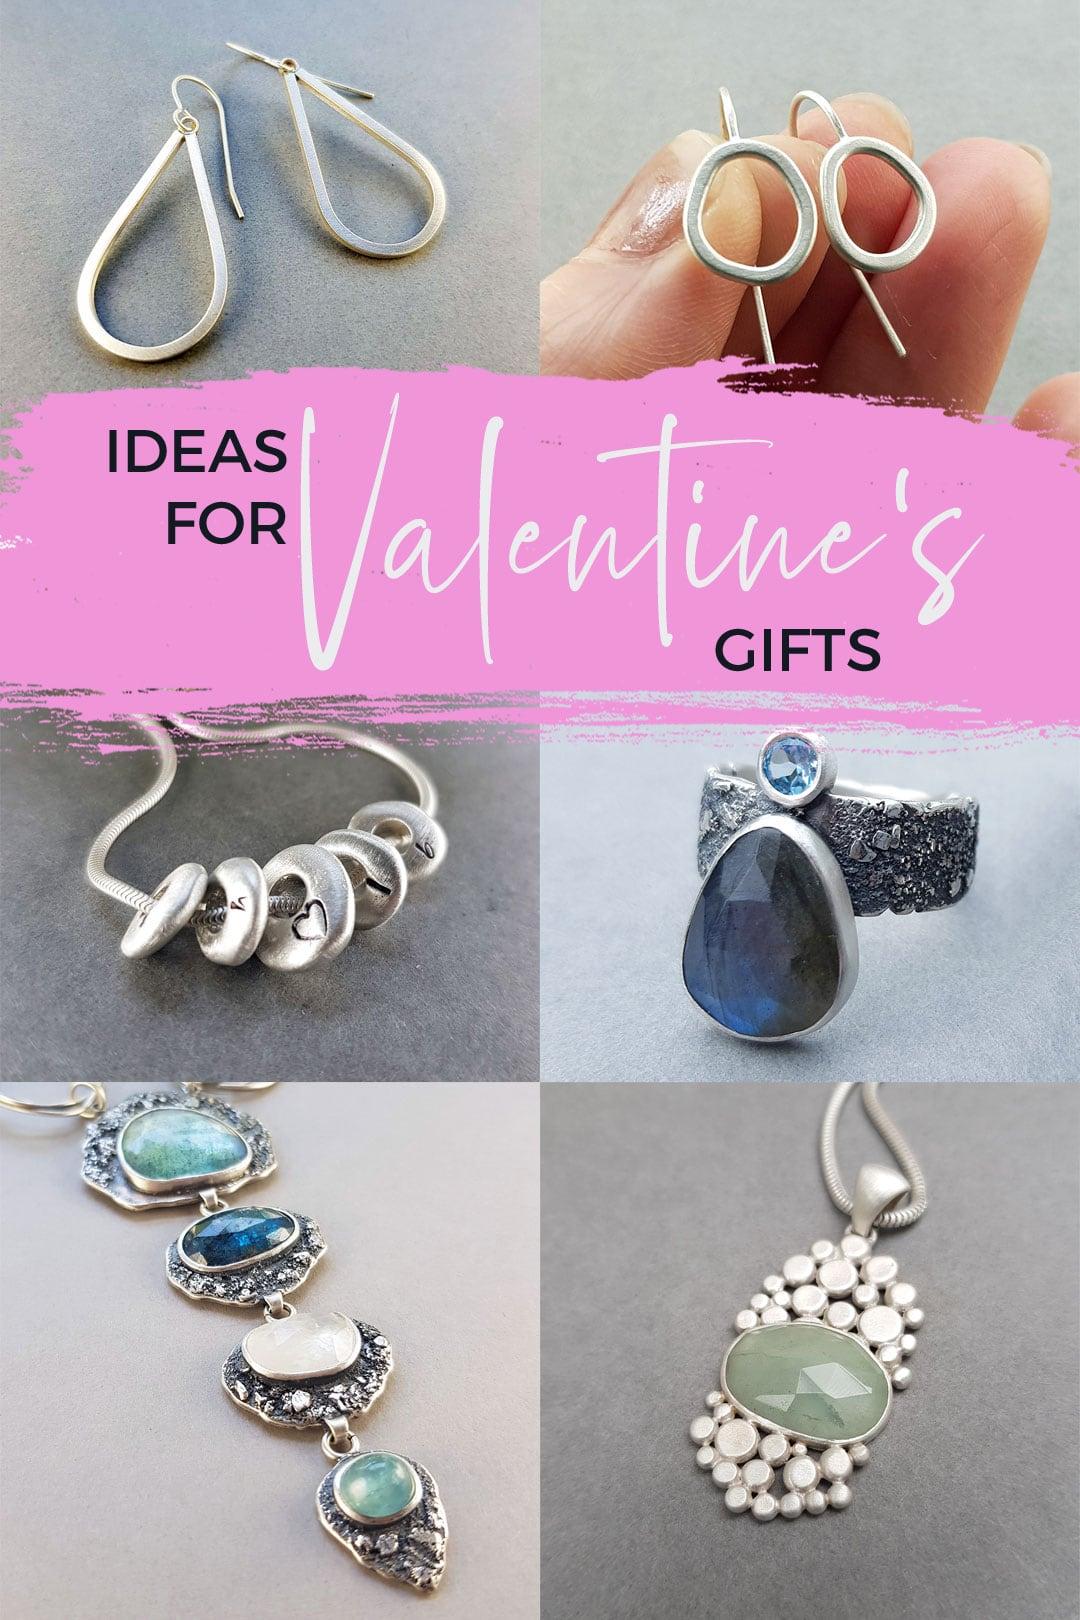 Valentine's jewellery gift ideas